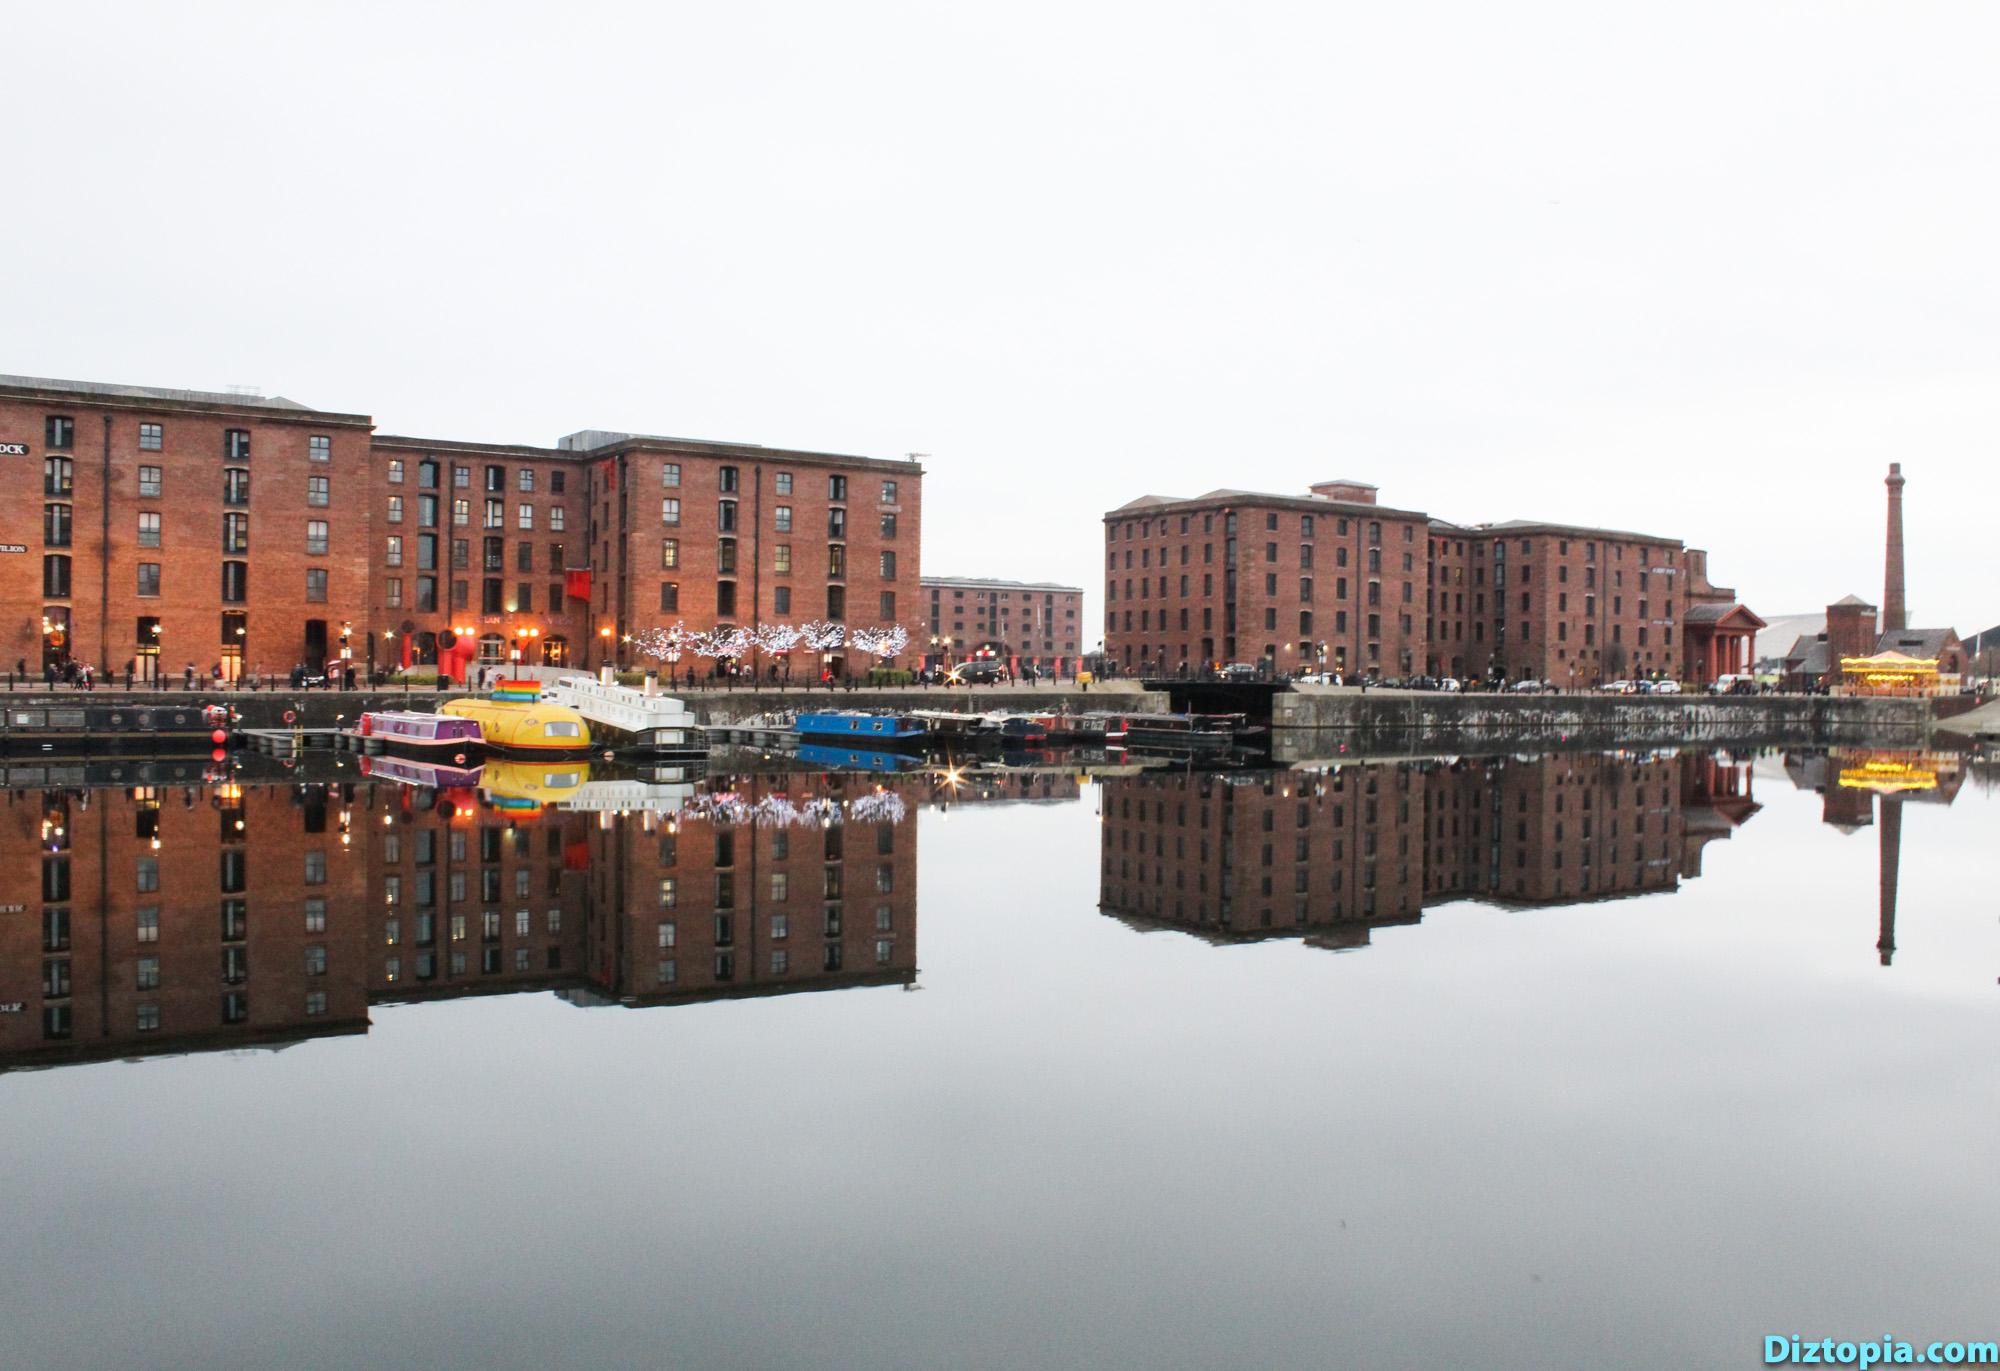 Liverpool-City-UK-Diztopia-Dizma-Dahl-Photography-2017-32-Albert-Dock-Queens-Wapping-Salthouse-Canning-Coburg-Dukes